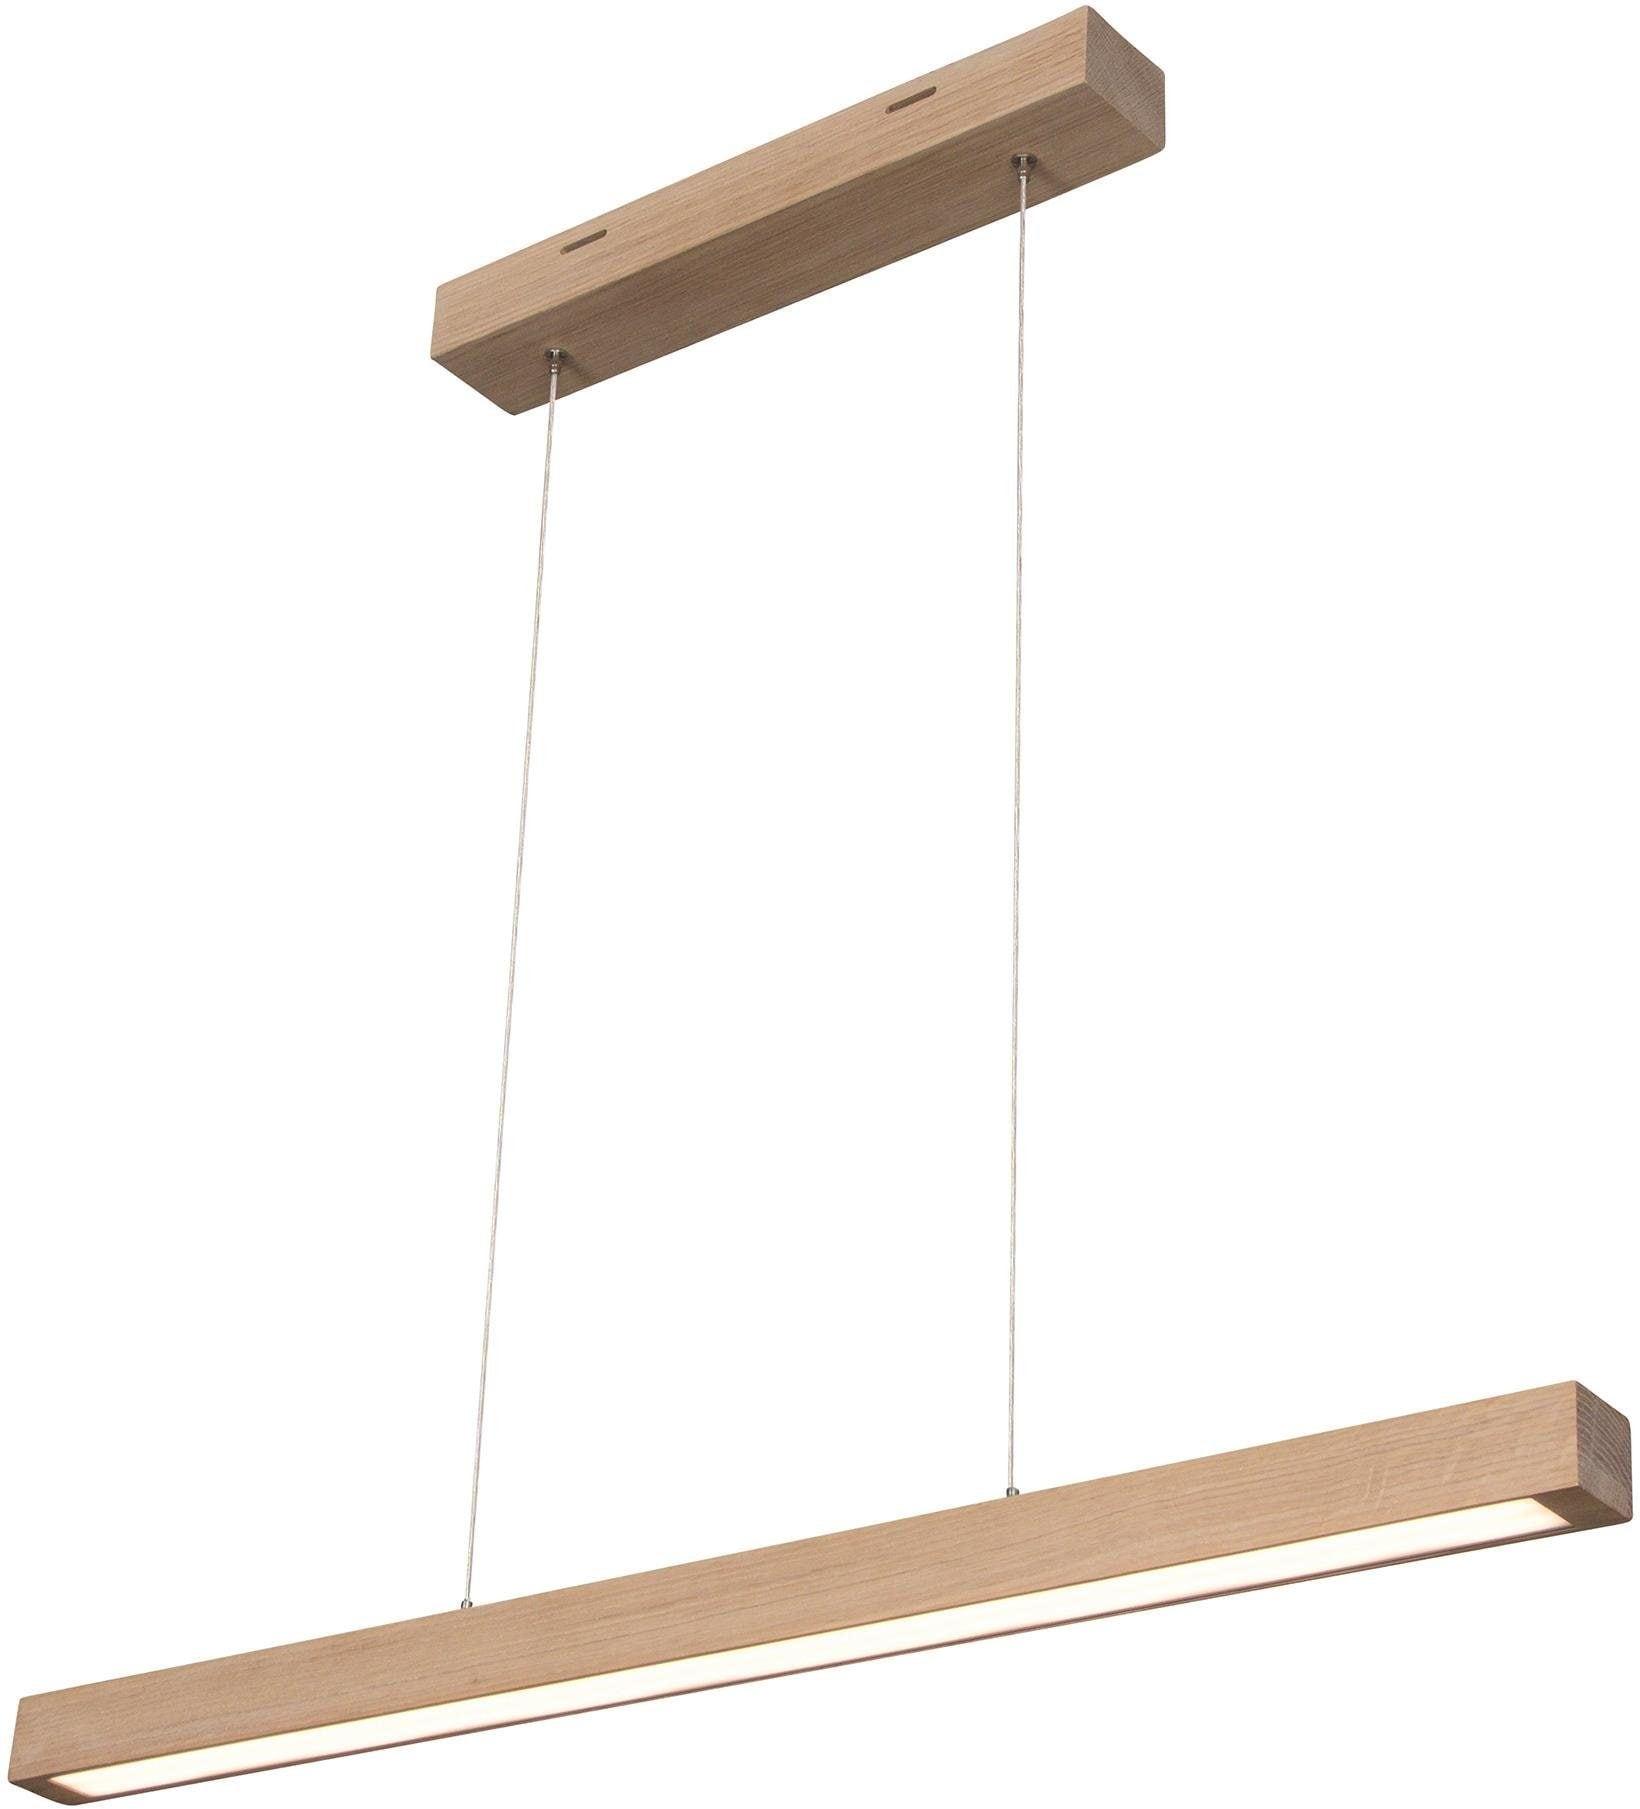 SPOT Light Pendelleuchte SMAL 2LED, LED-Modul, Warmweiß, Hängeleuchte, mit integriertem 24V-LED-Modul, mit Touch Dimmer, aus edlem Eichenholz, Naturprodukt FSC-zertifiziert, Made in Europe